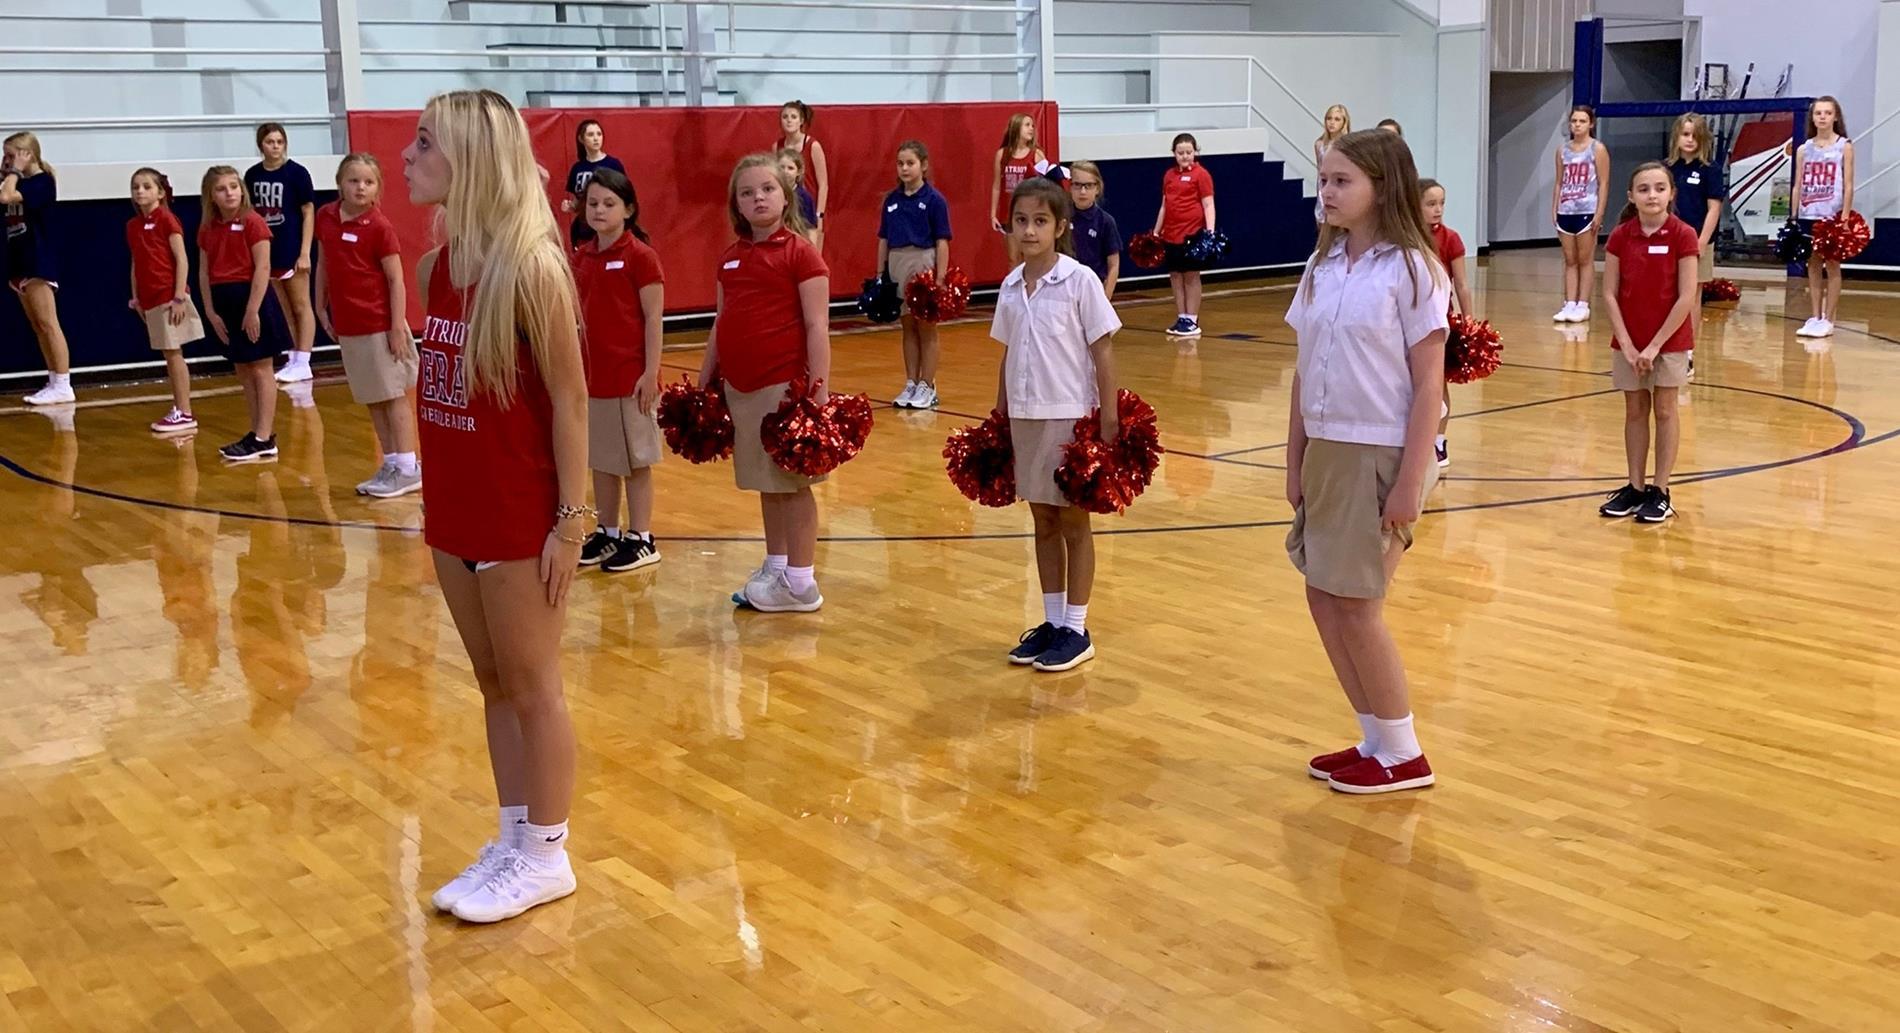 Elementary Cheer Camp